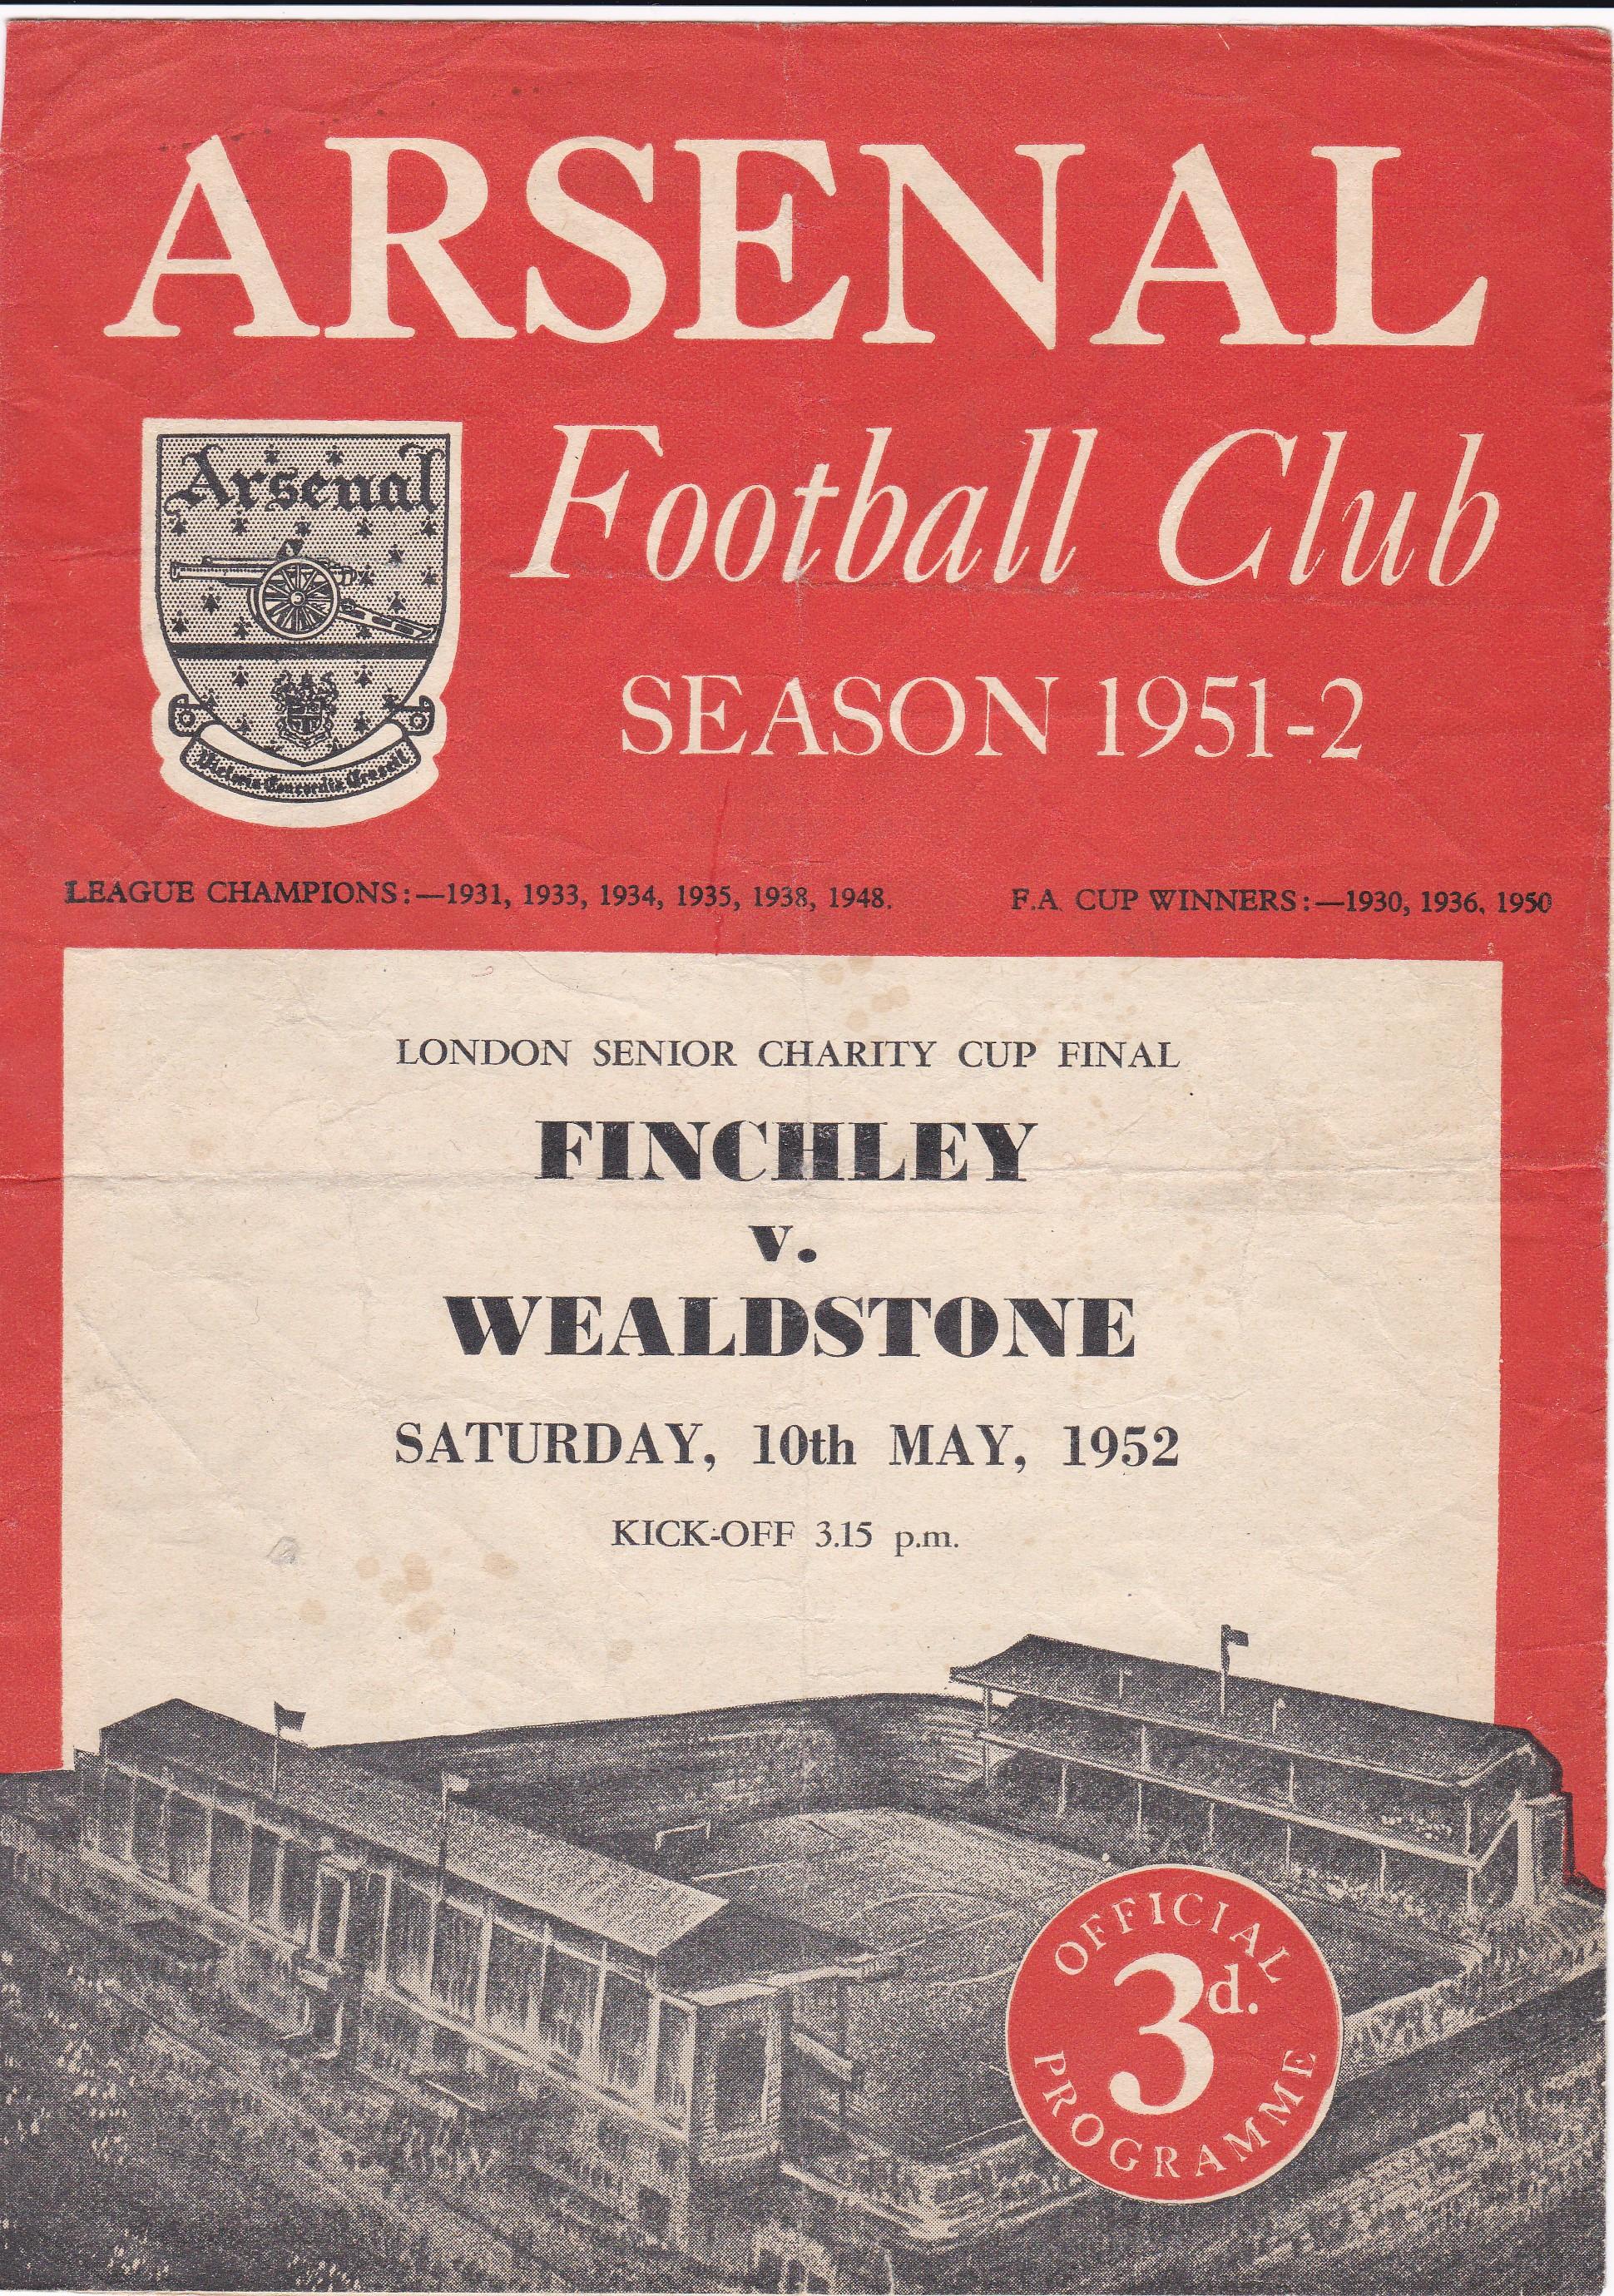 Finchley v Wealdstone 1952 May 10th London Senior Charity Cup Final played at Arsenal horizontal and